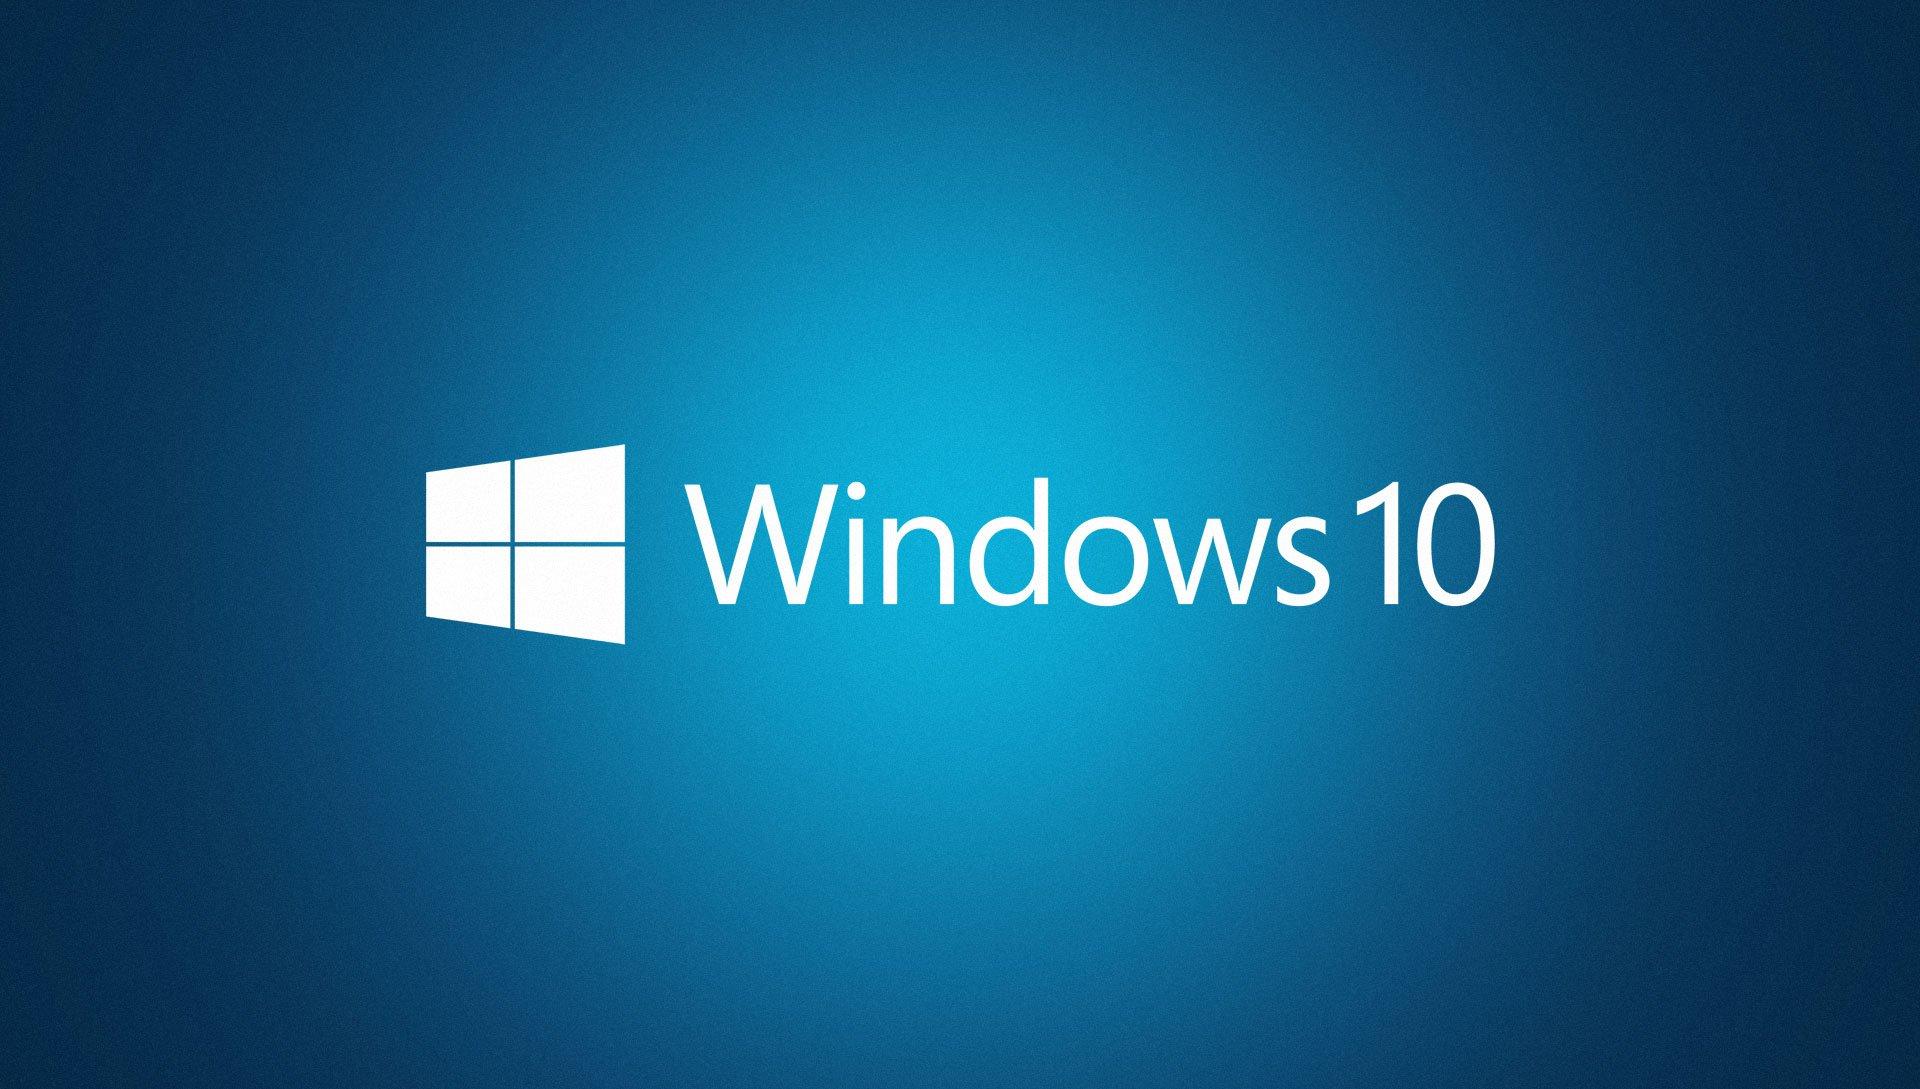 windows-10-hero_large1.jpg